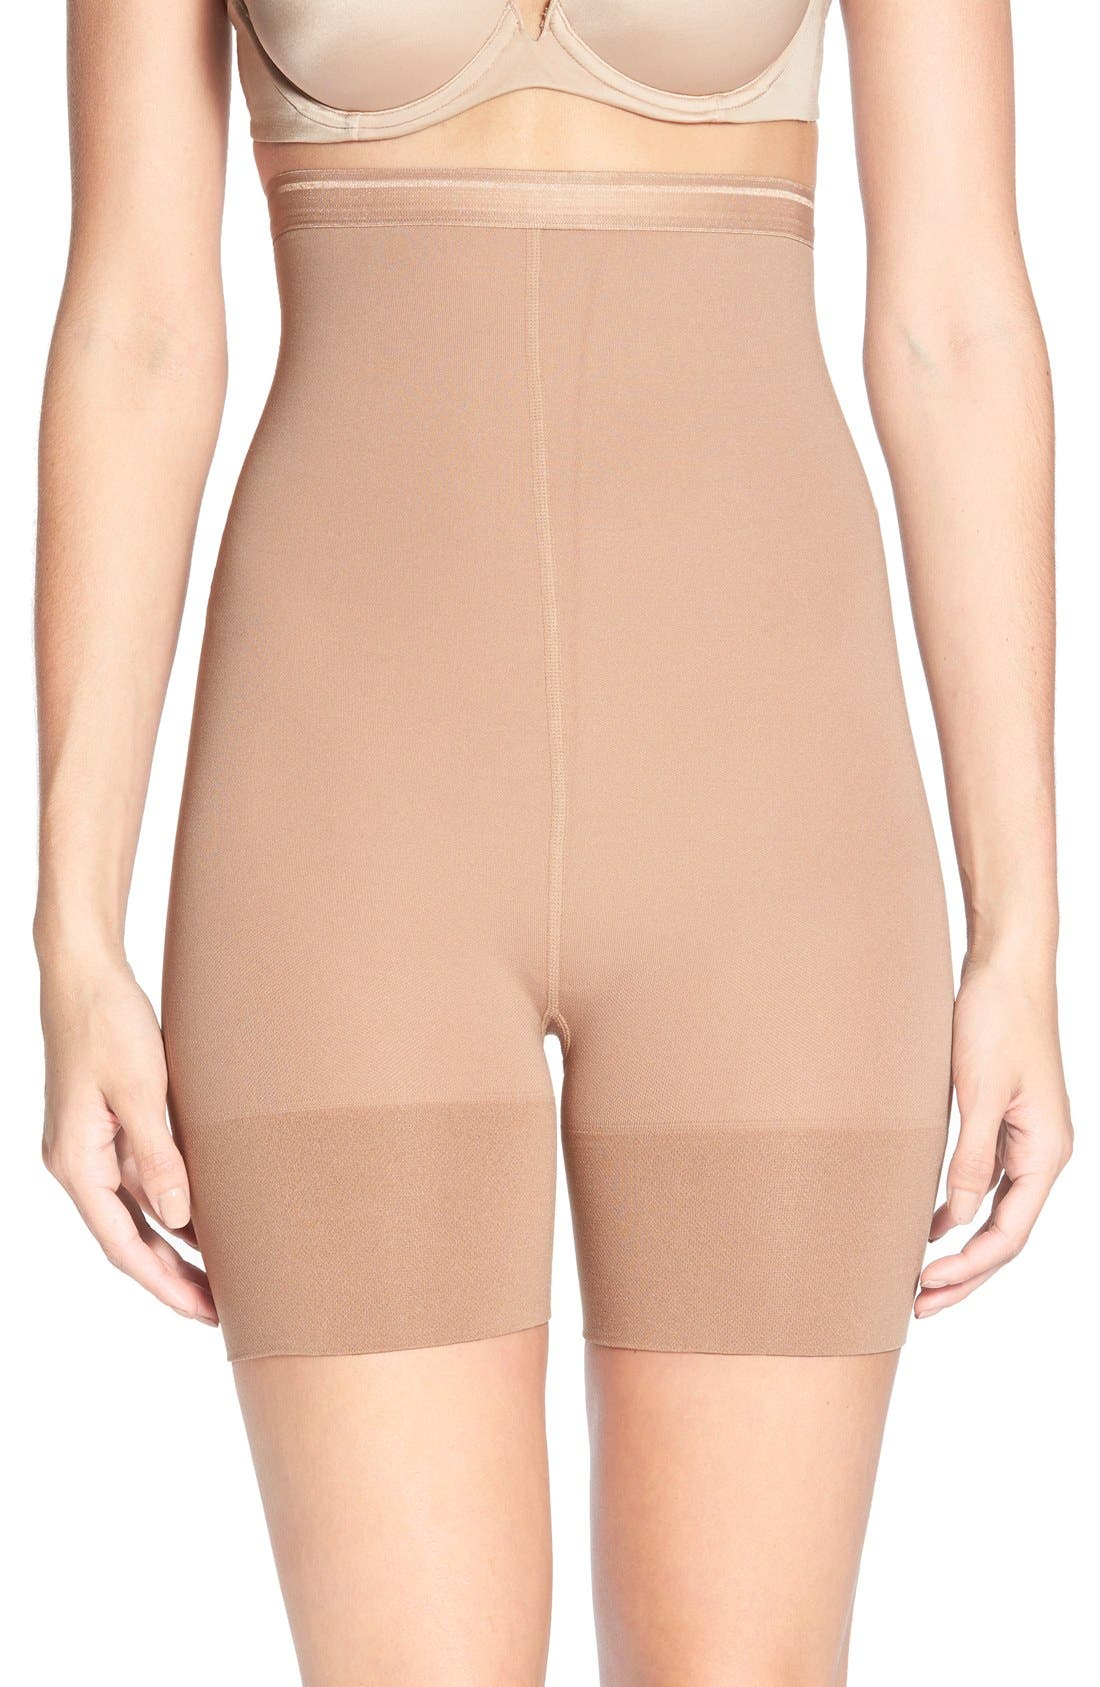 ITEM m6 Shorty Shaping Shorts